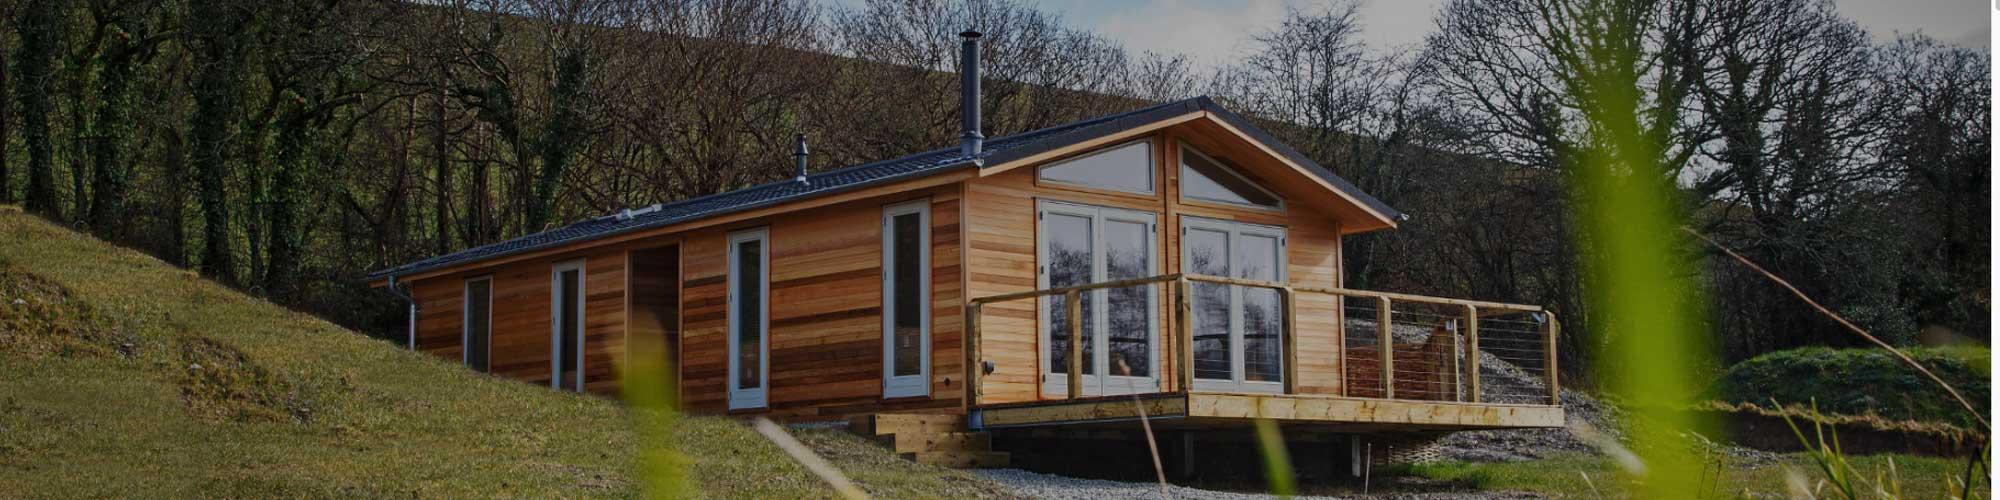 sovereign-park-homes